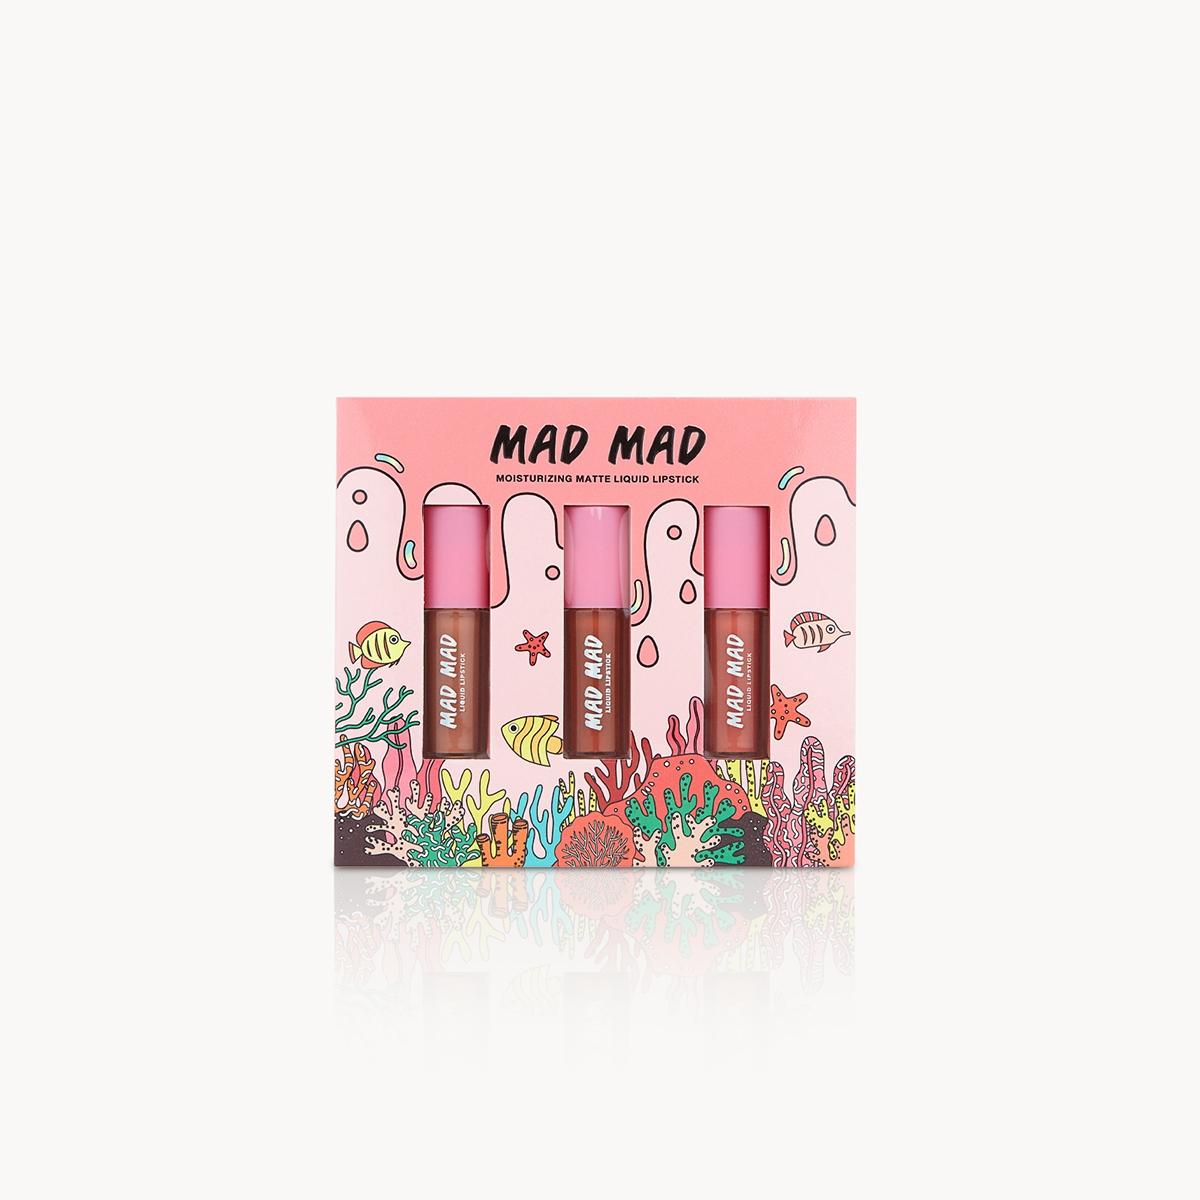 Mad Mad Matte Liquid Lipstick Box Set